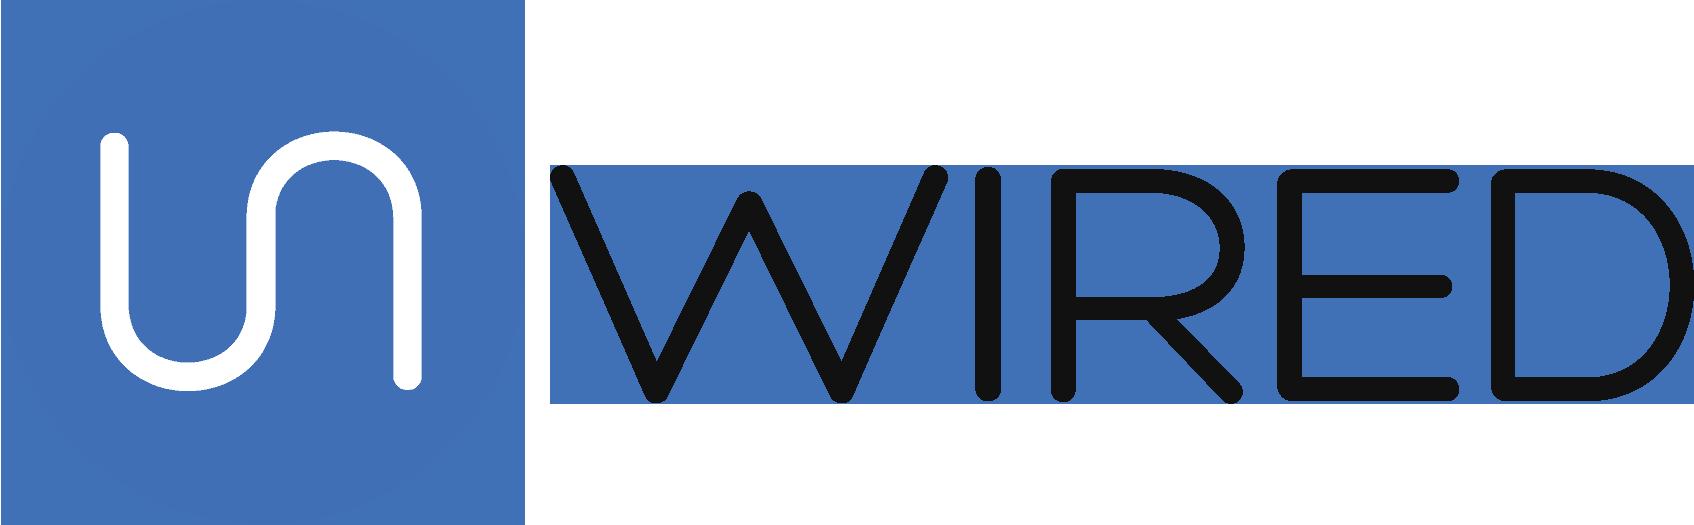 unWired Broadband logo.